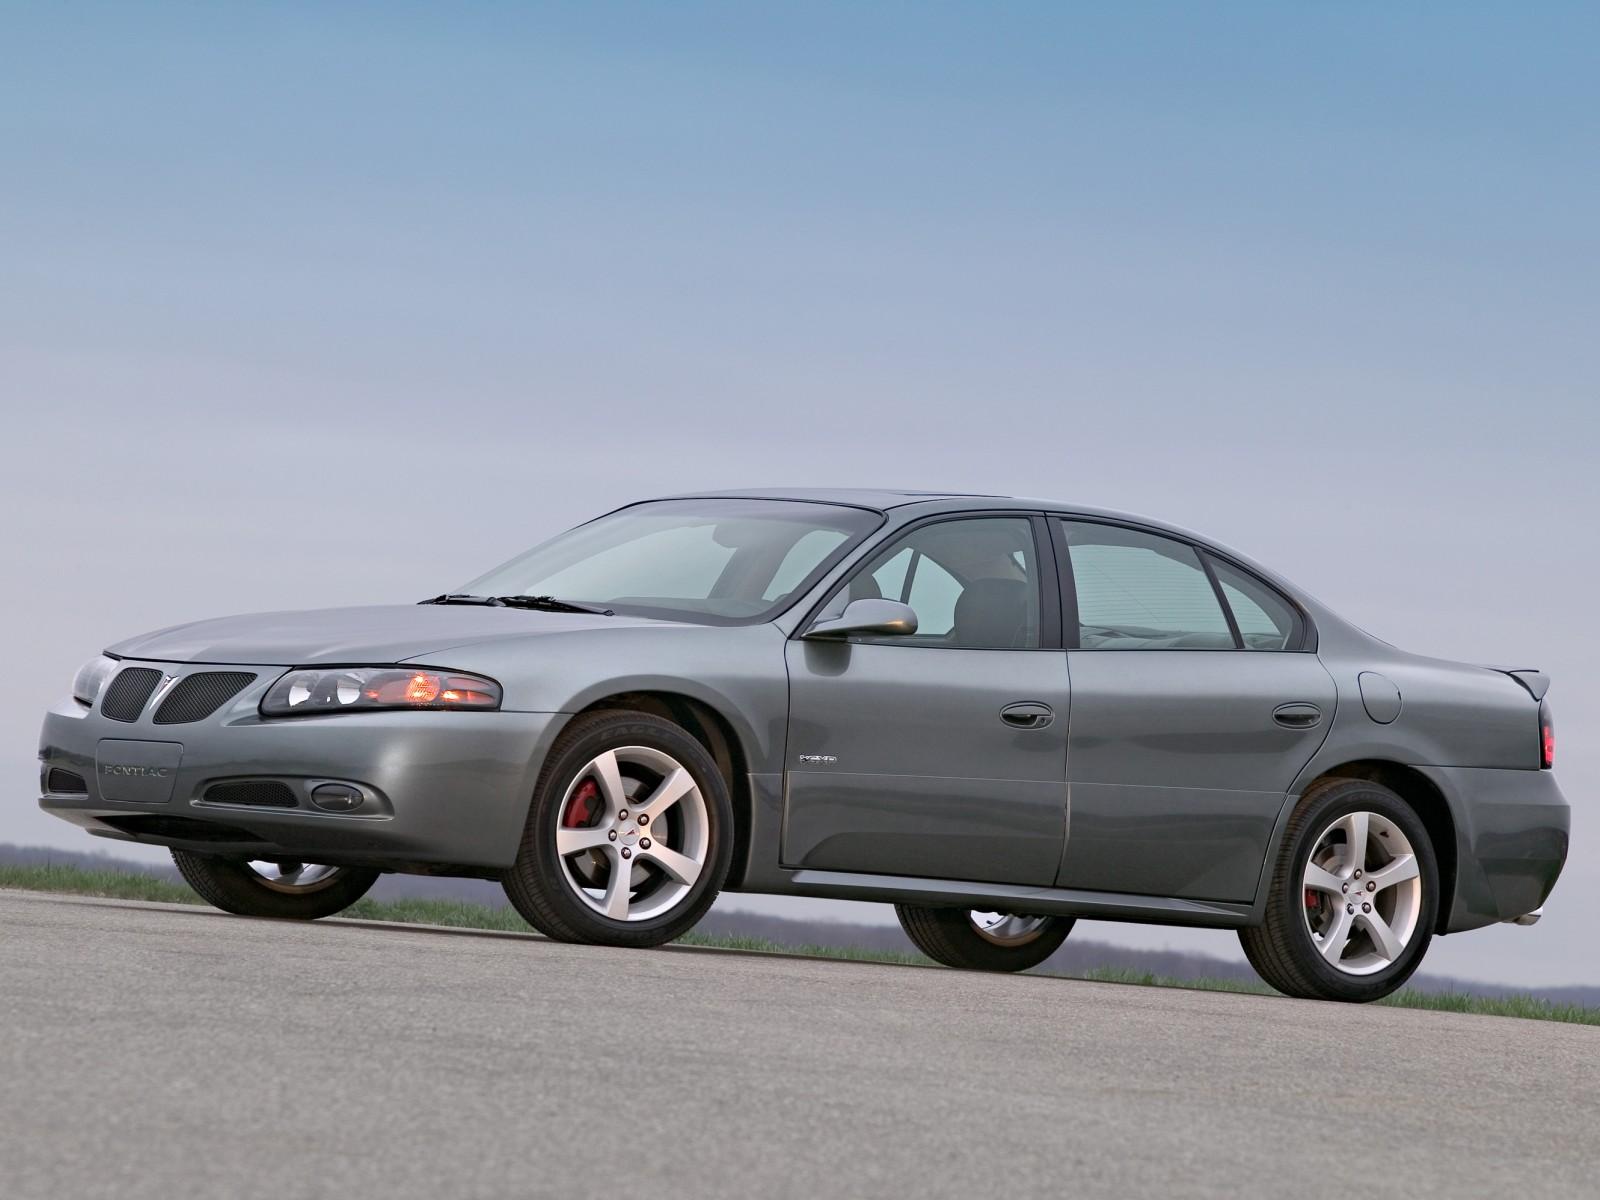 2005 Pontiac Bonneville GXP | Motor Desktop